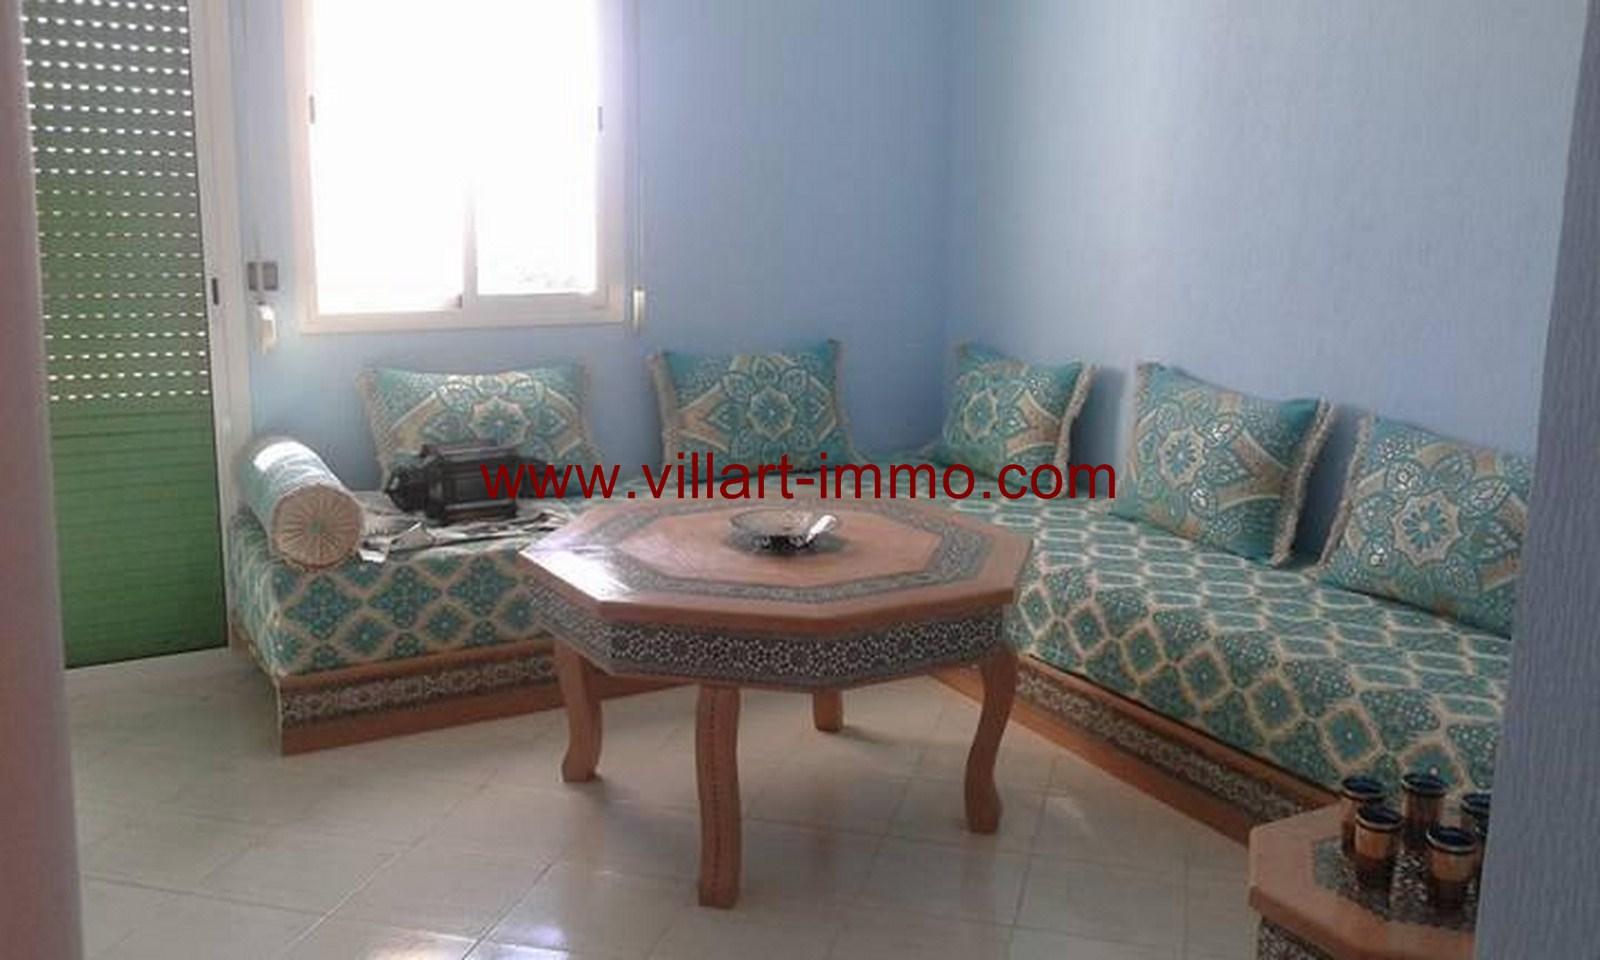 3-Vente-Appartement-Assilah-Autres-Salon-VA62-Villart Immo